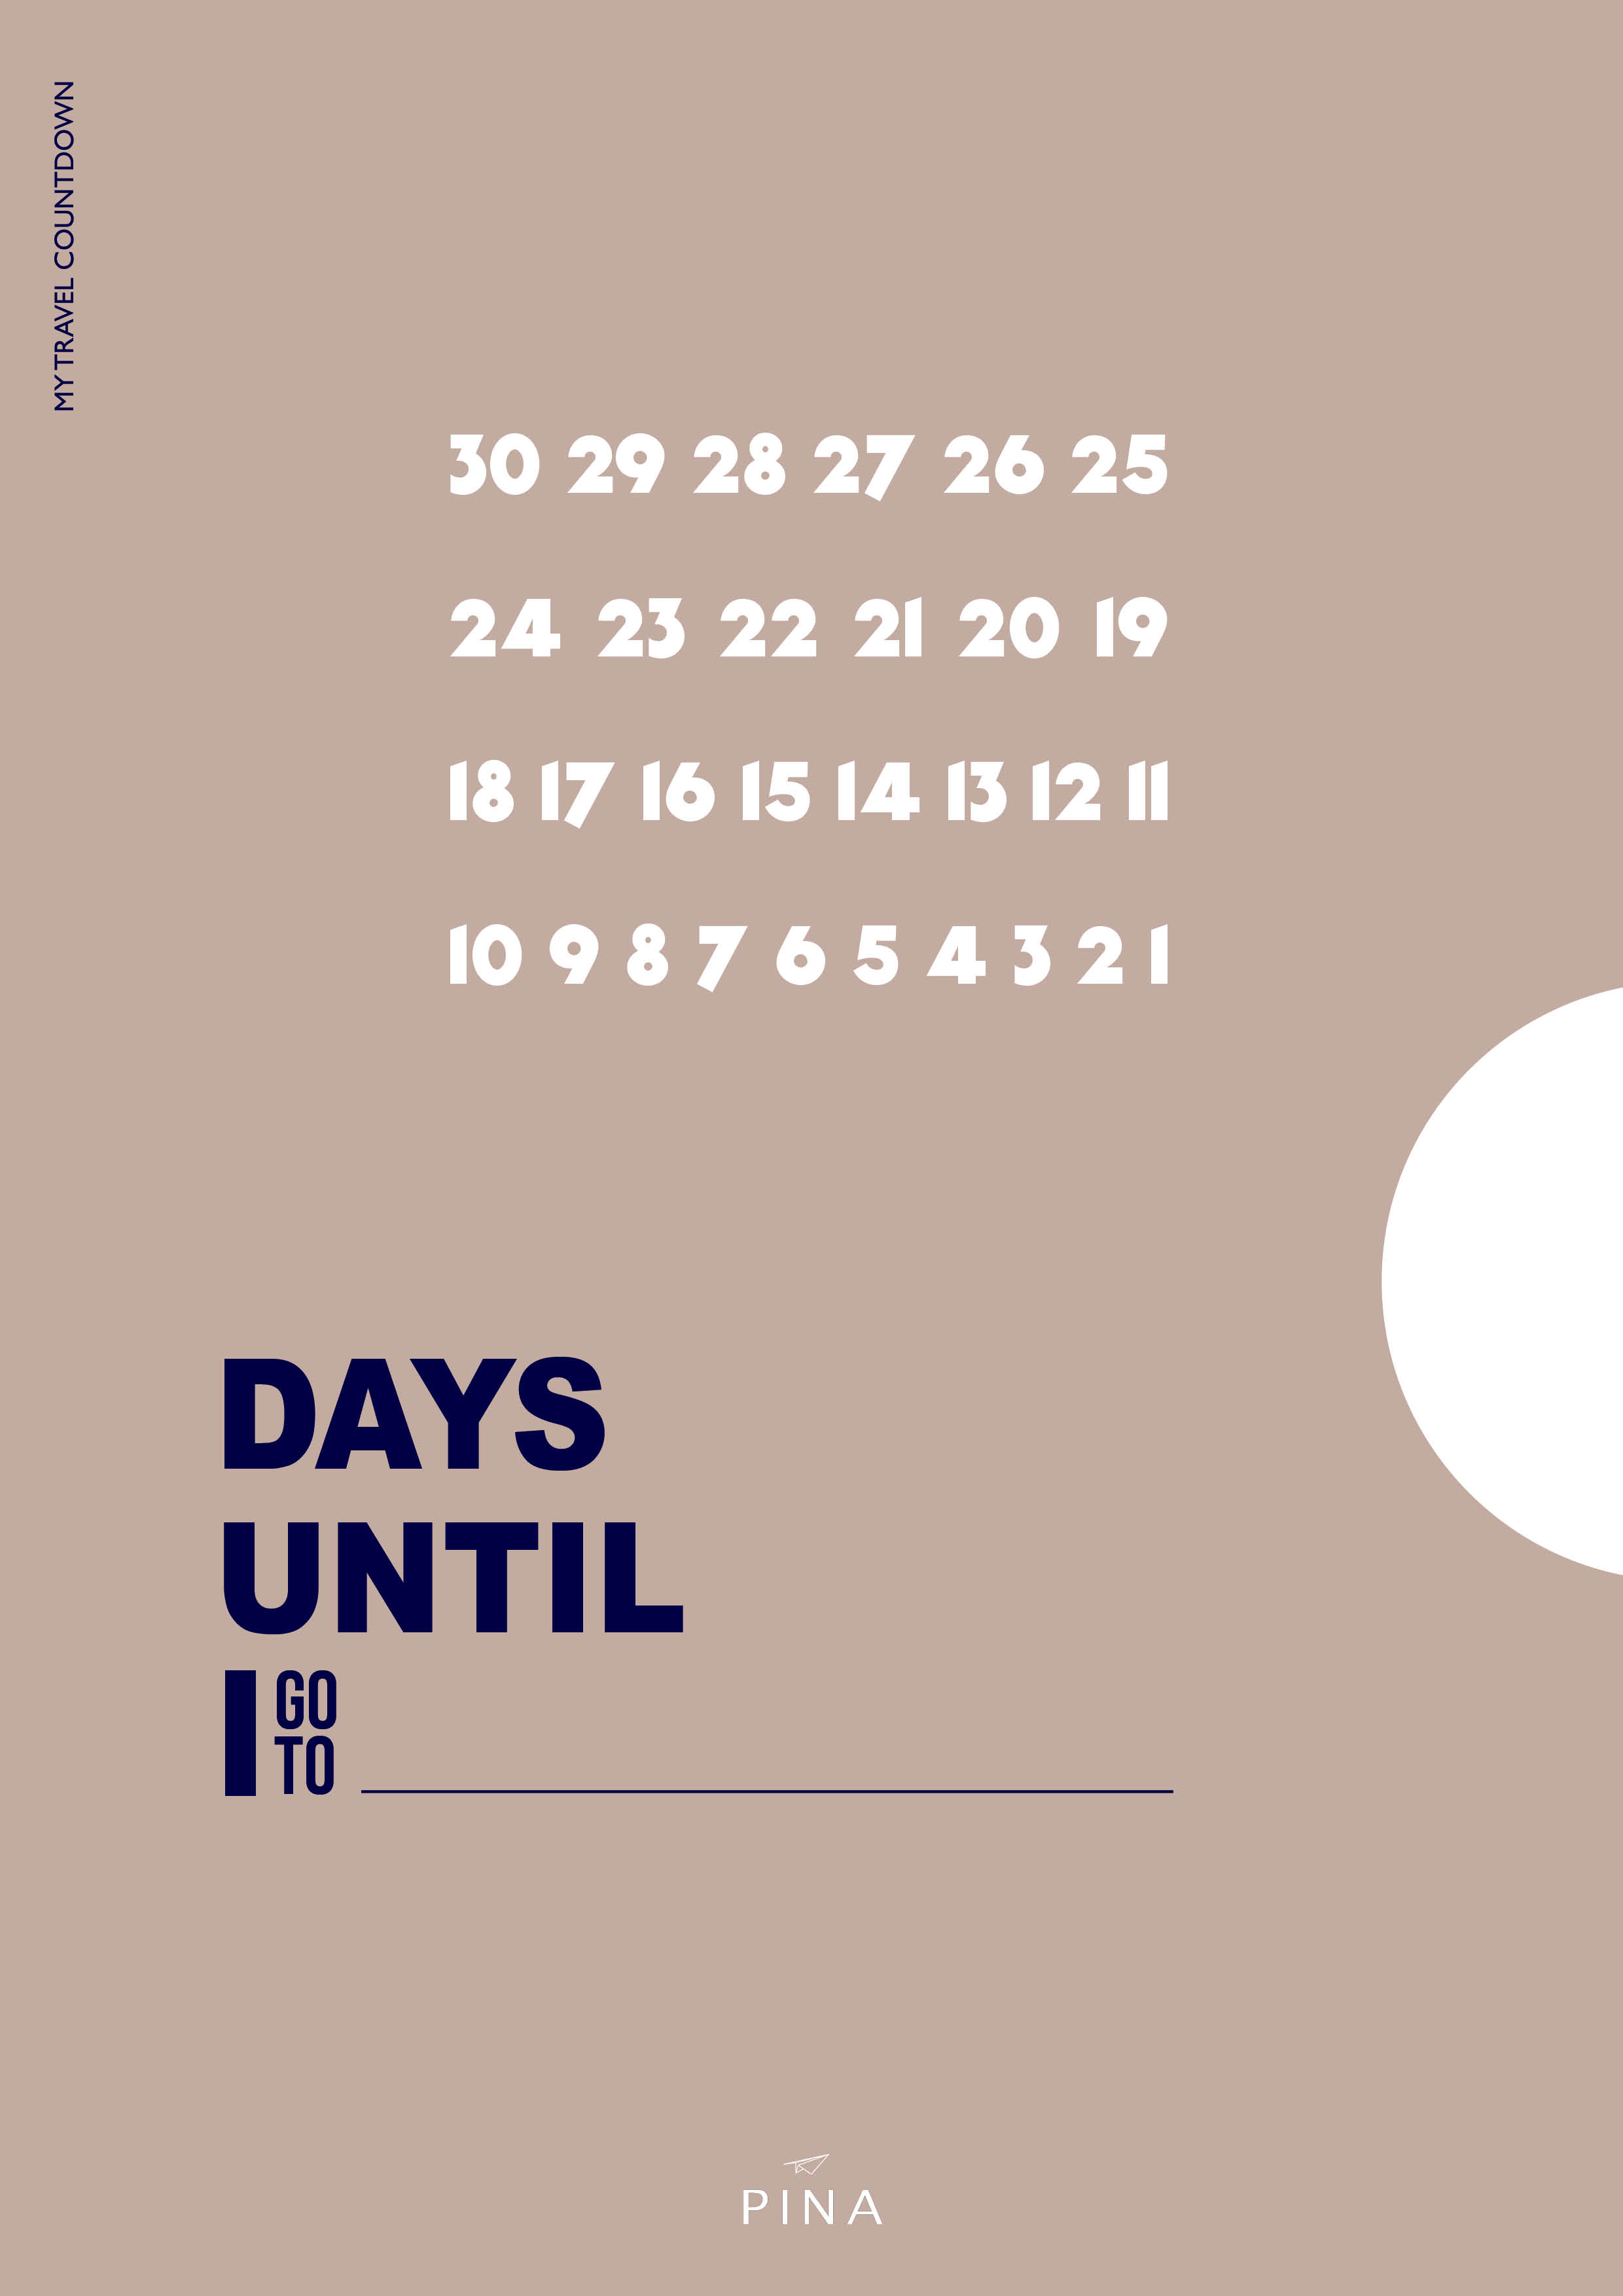 Travel_countdown